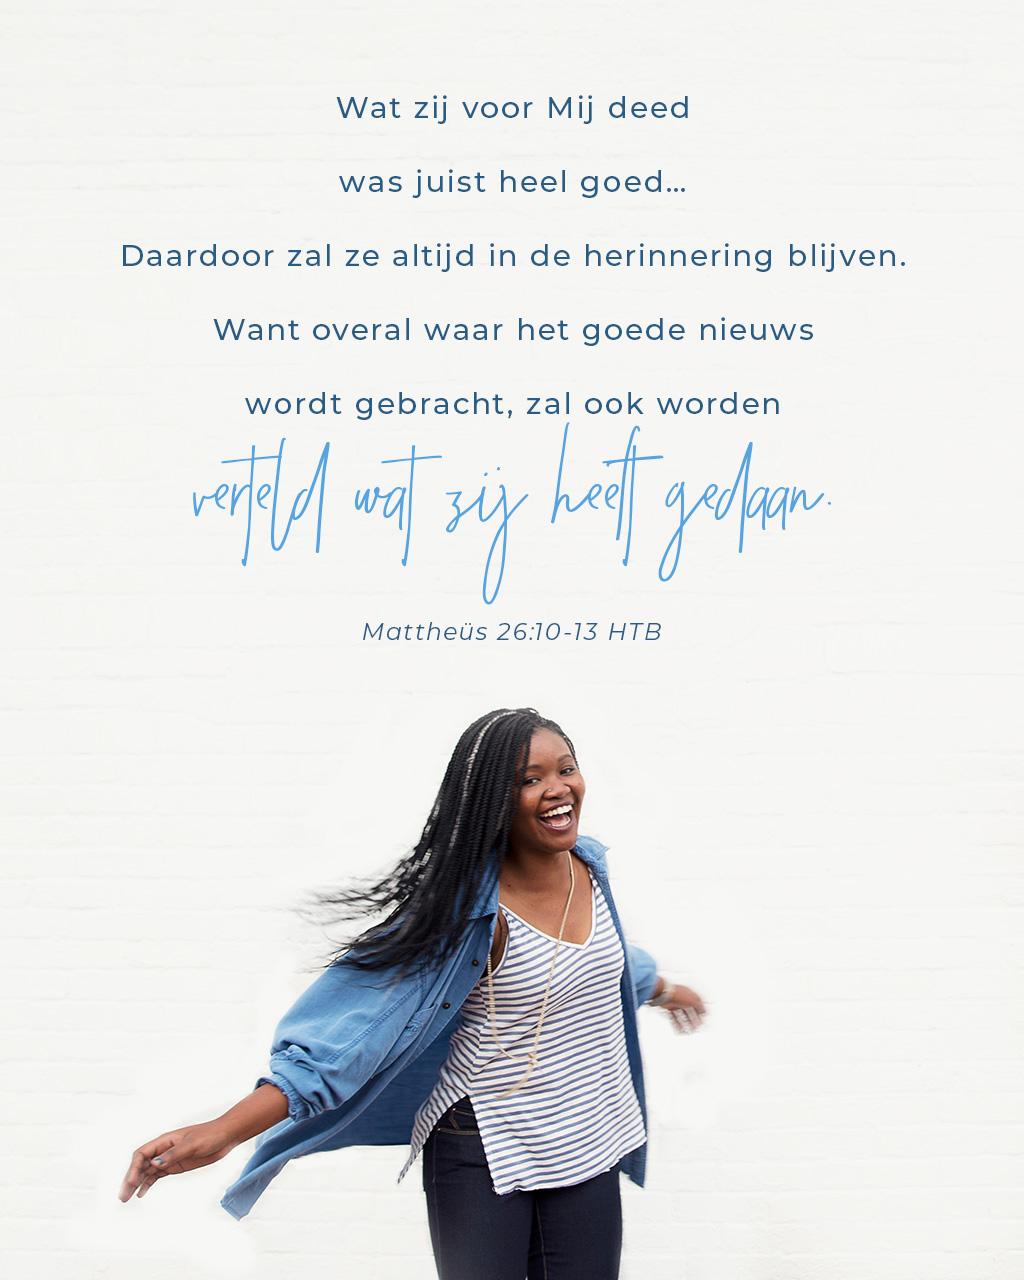 Afbeelding Mattheus 26:10-13